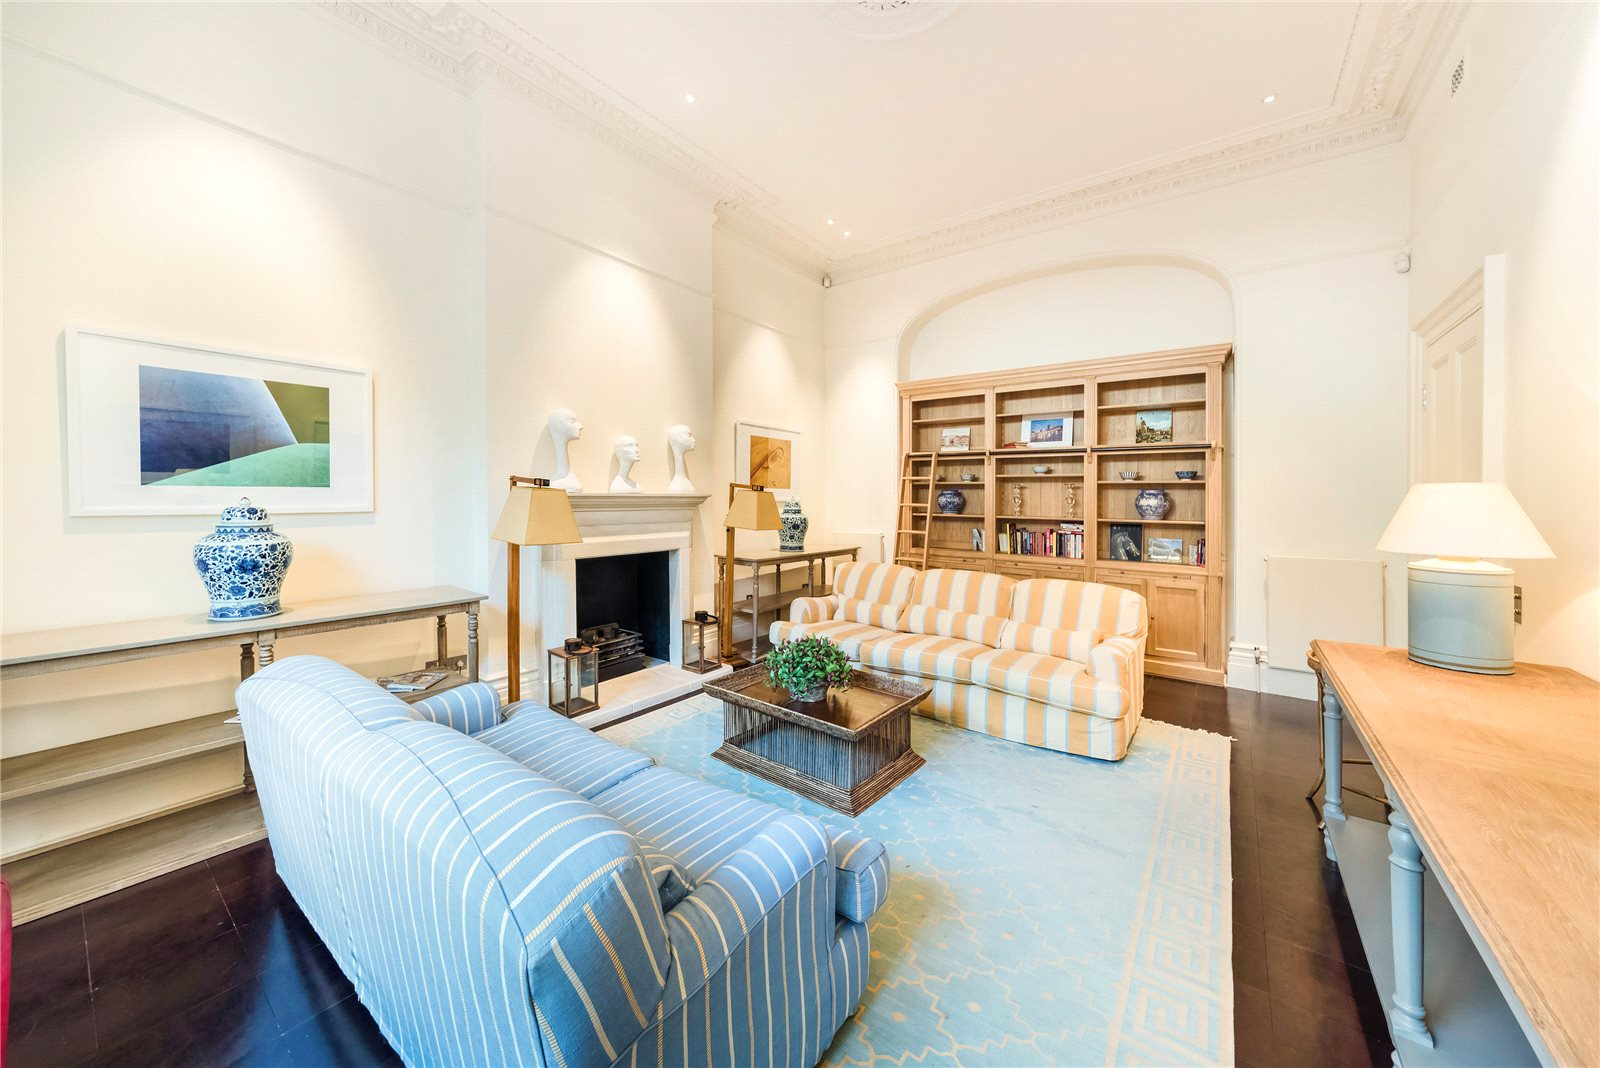 Апартаменты / Квартиры для того Продажа на Roland Gardens, South Kensington, SW7 South Kensington, Англия